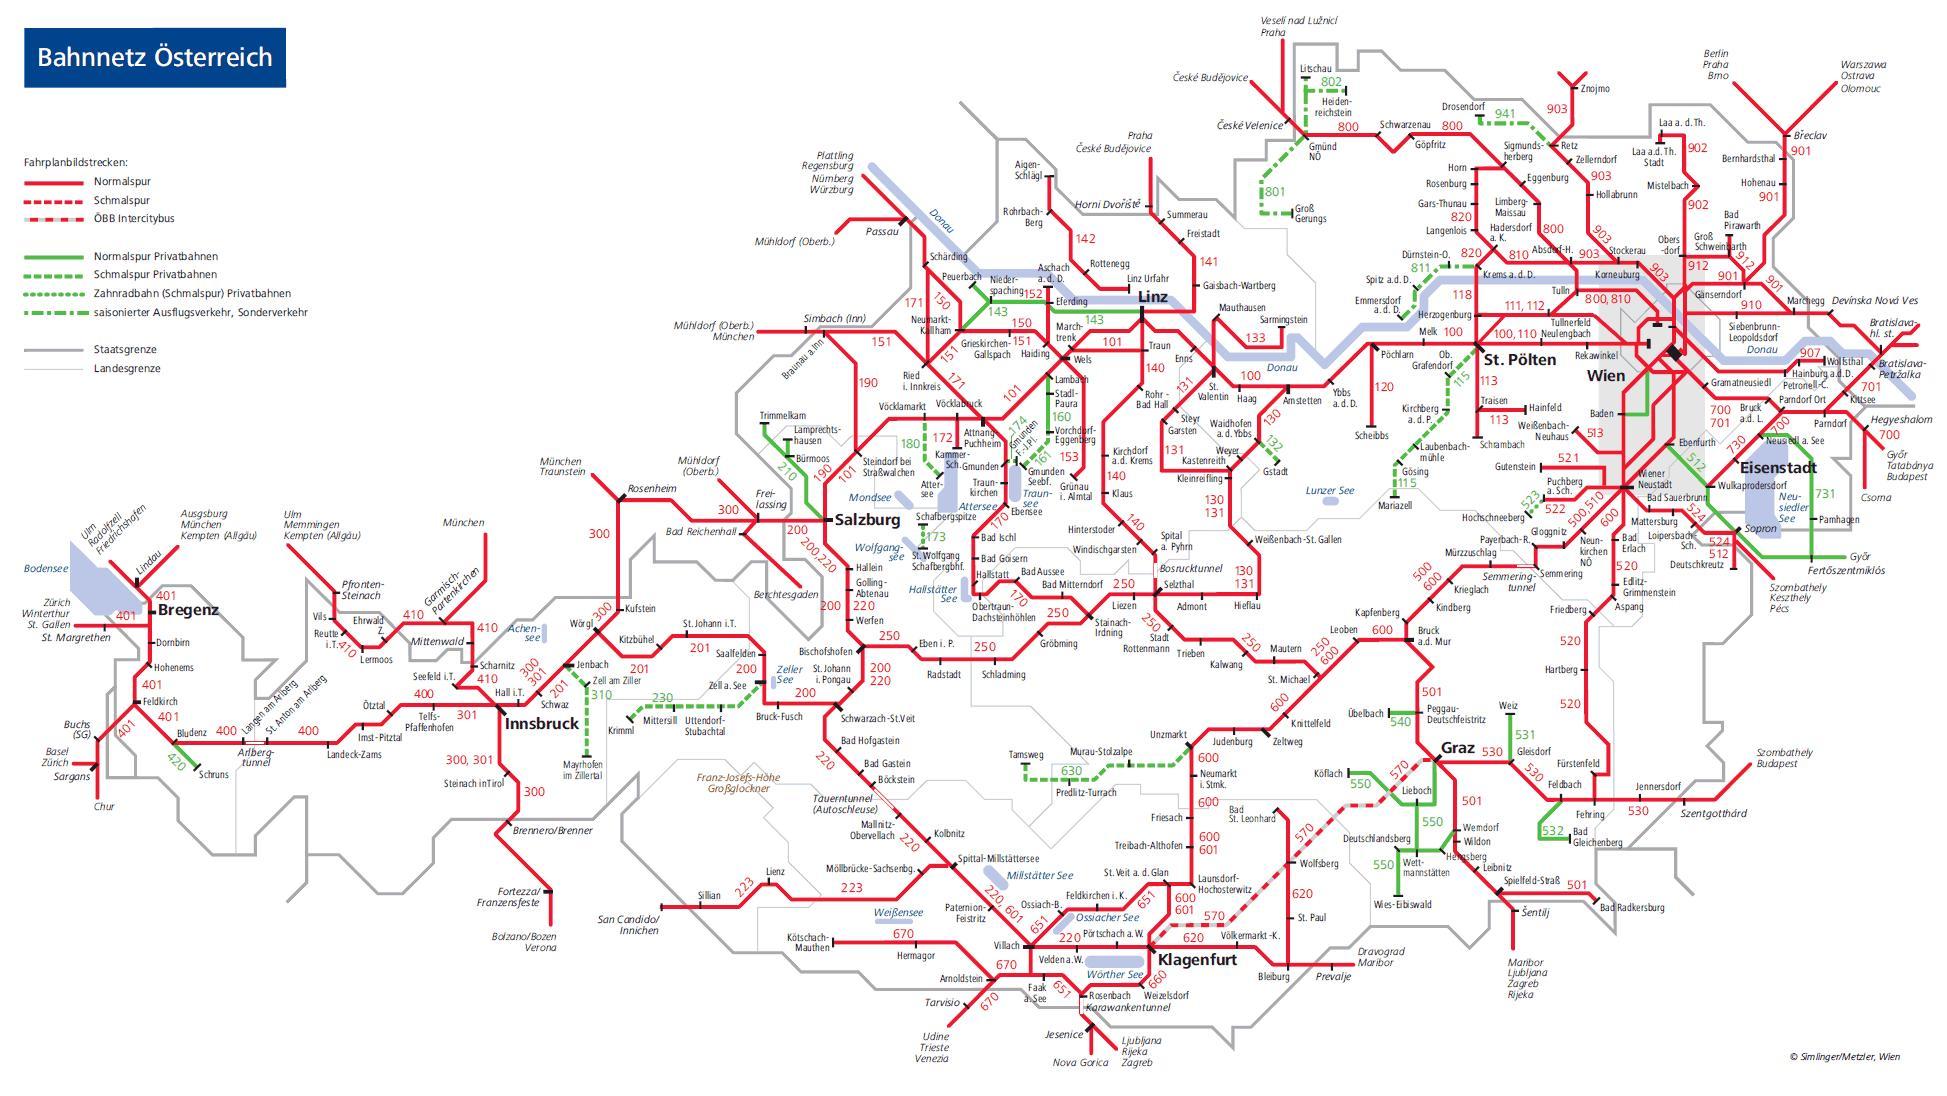 Rakousko Vlak Mapa Obb Rakouske Zeleznicni Mapa Zapadni Evropa